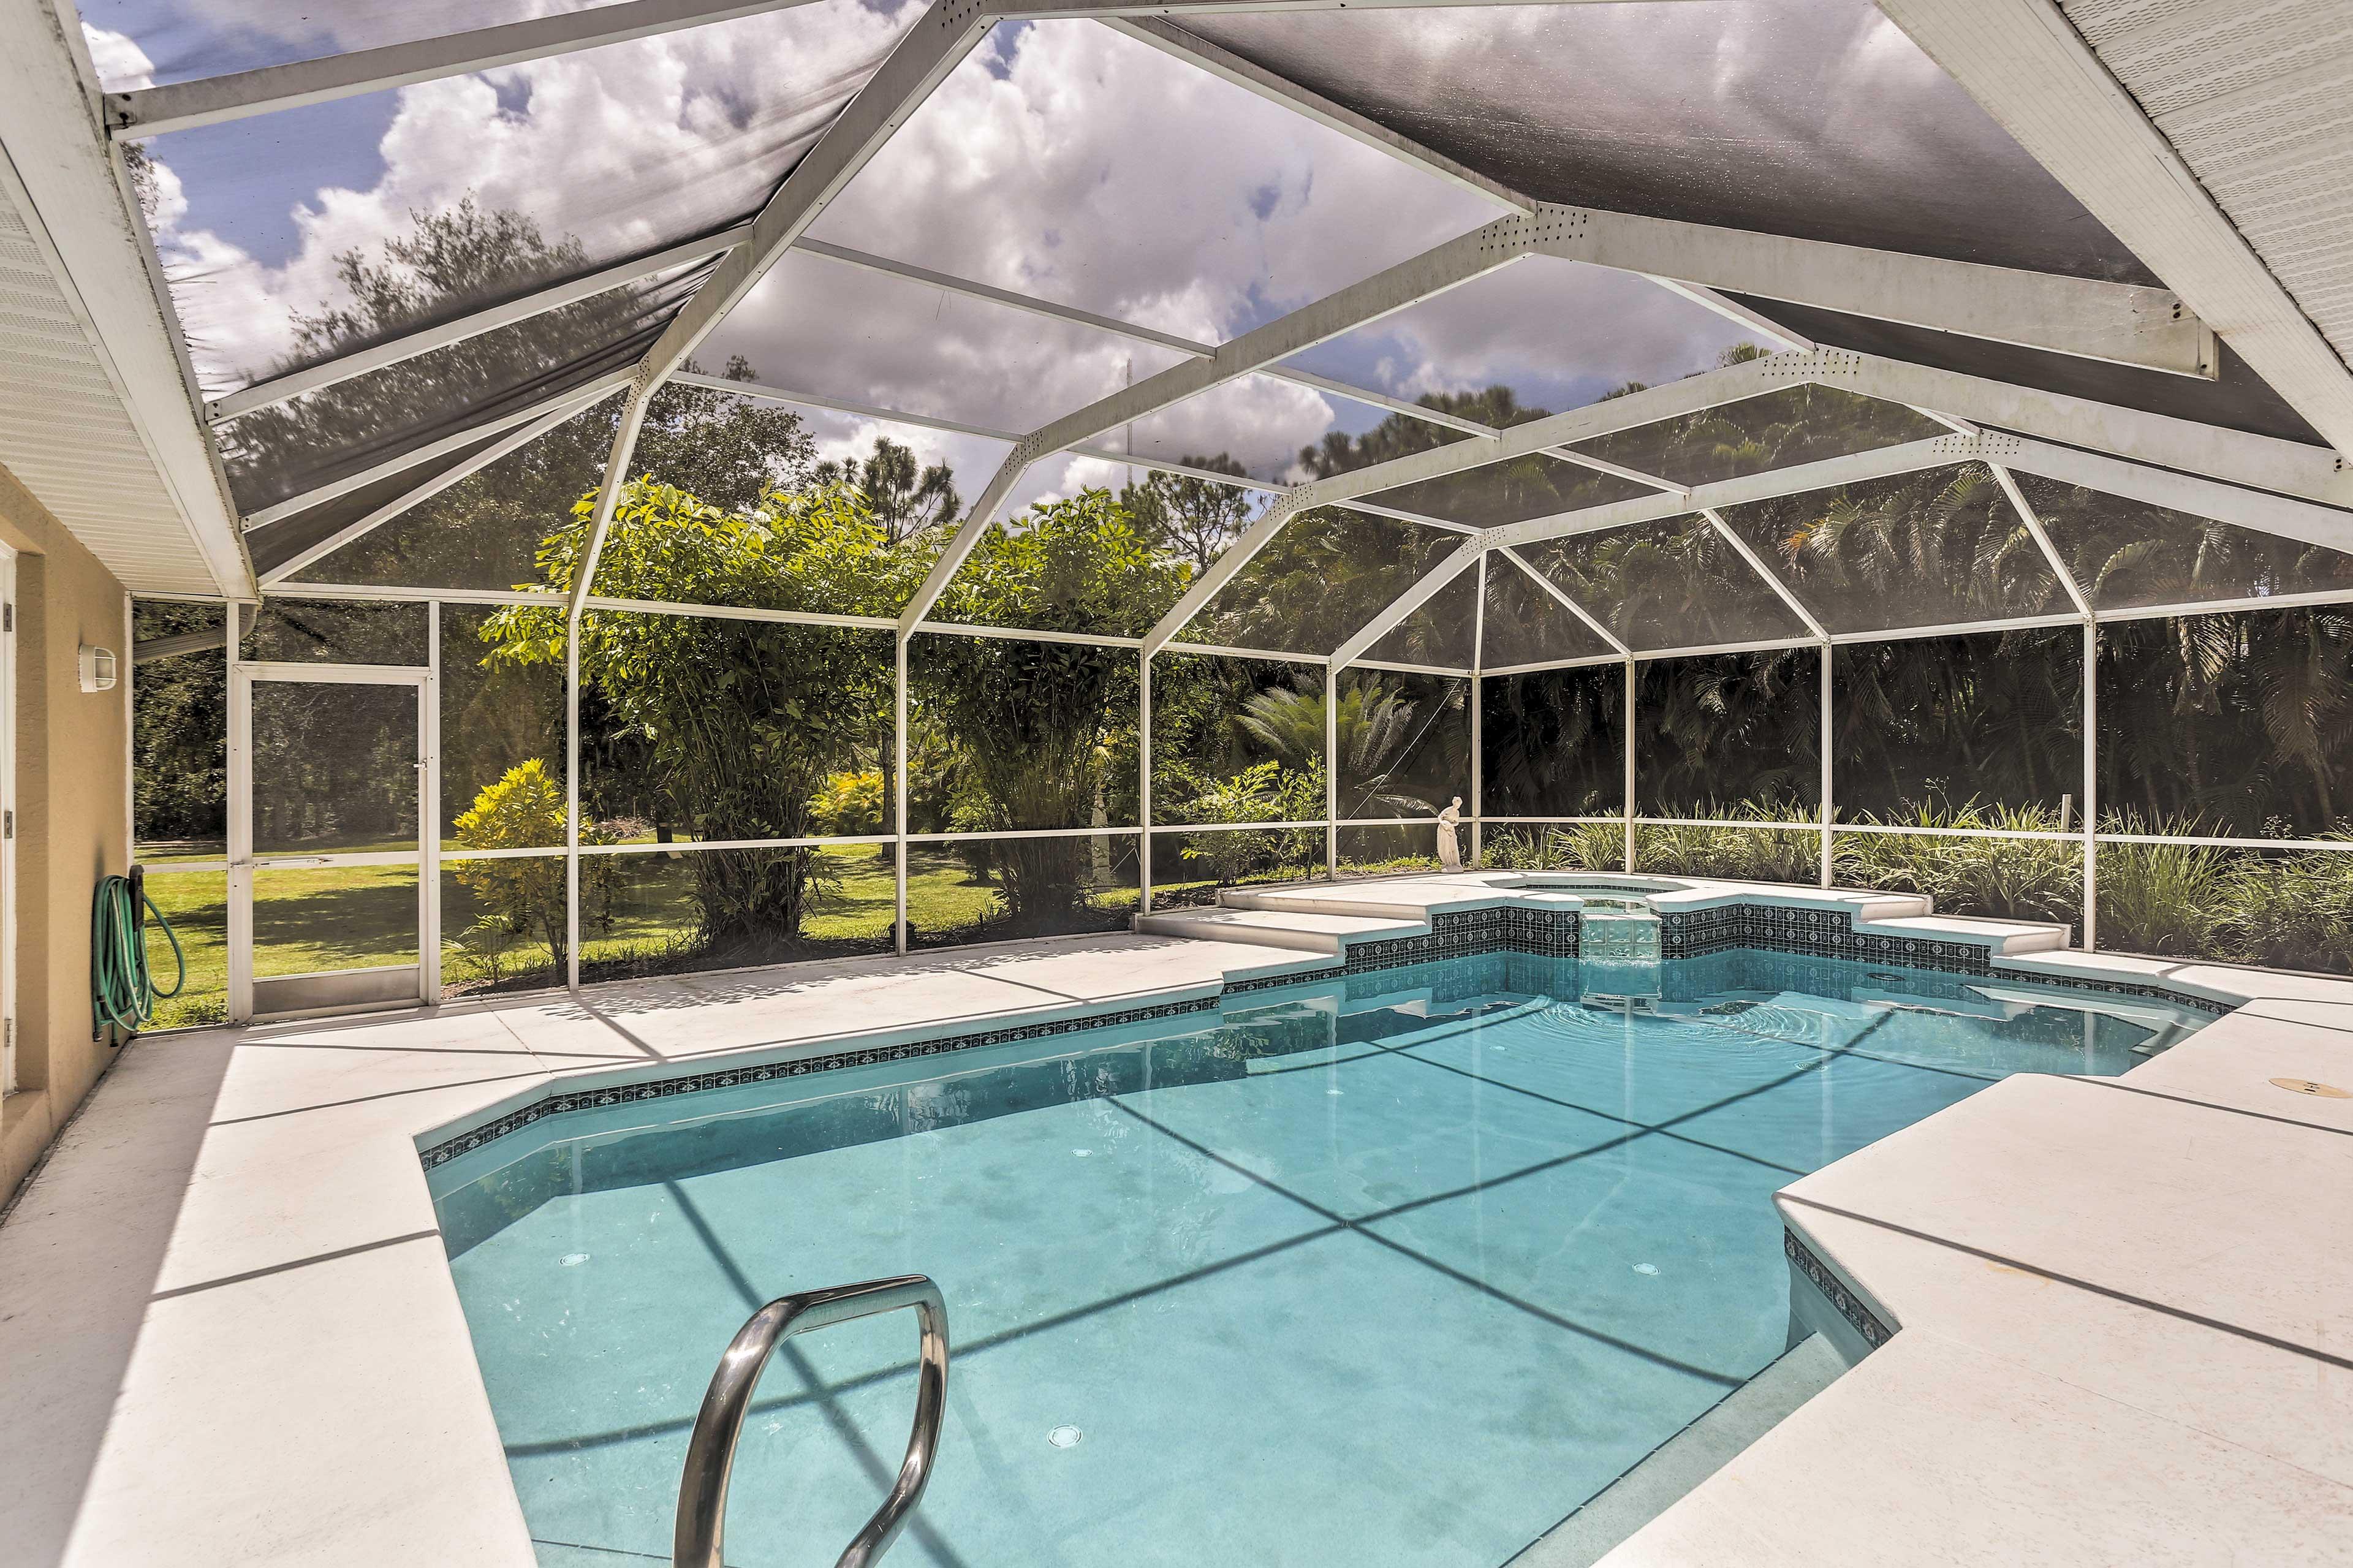 Private Screened Pool | Spa | Backyard